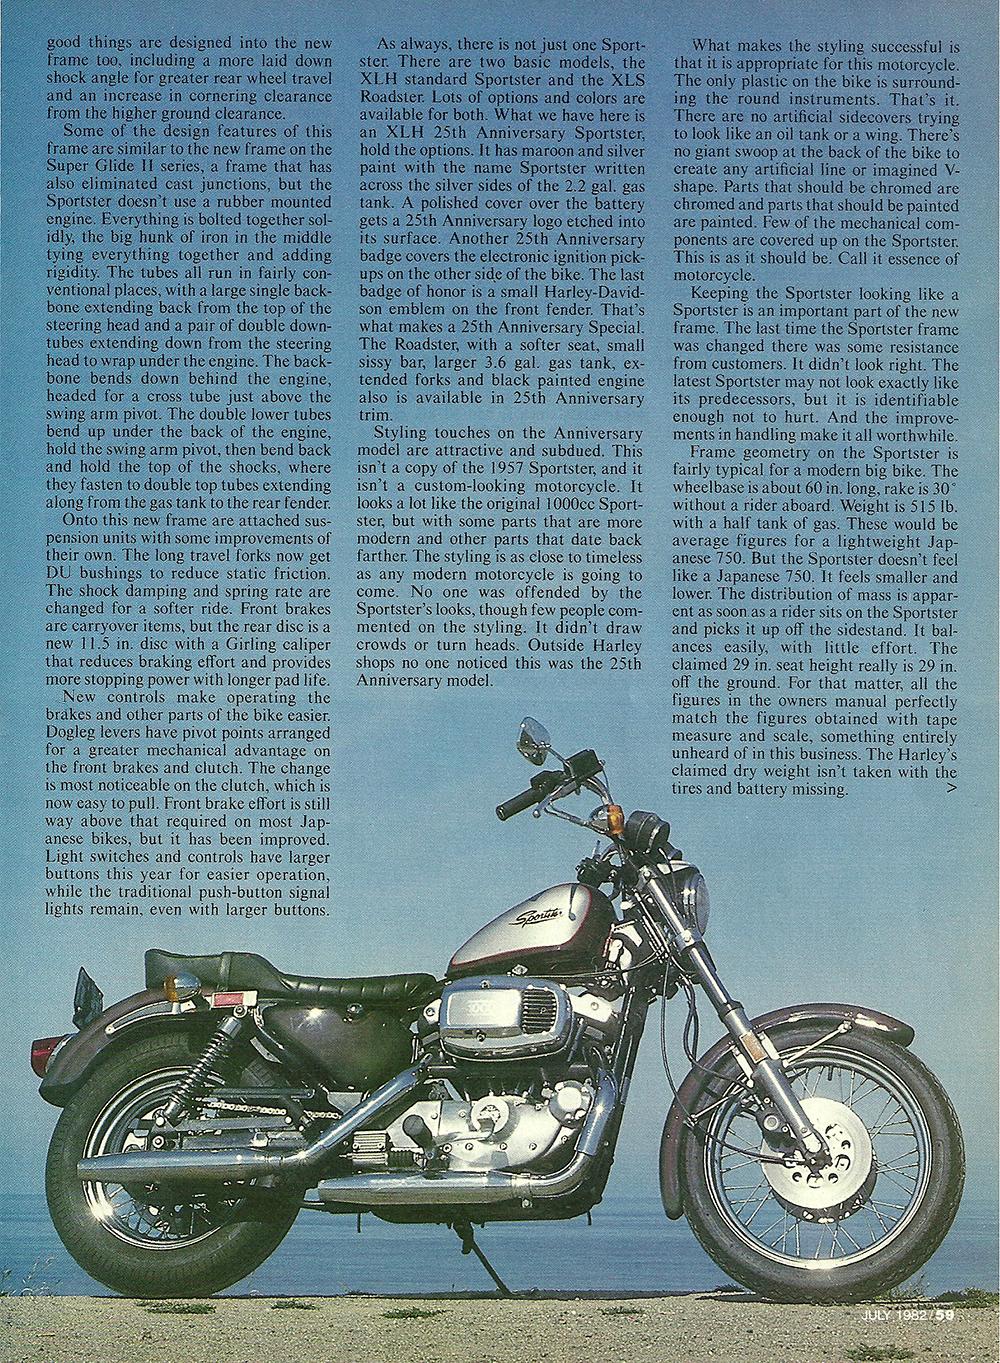 1982 Harley Davidson XLS Sportster 25th road test 02.jpg